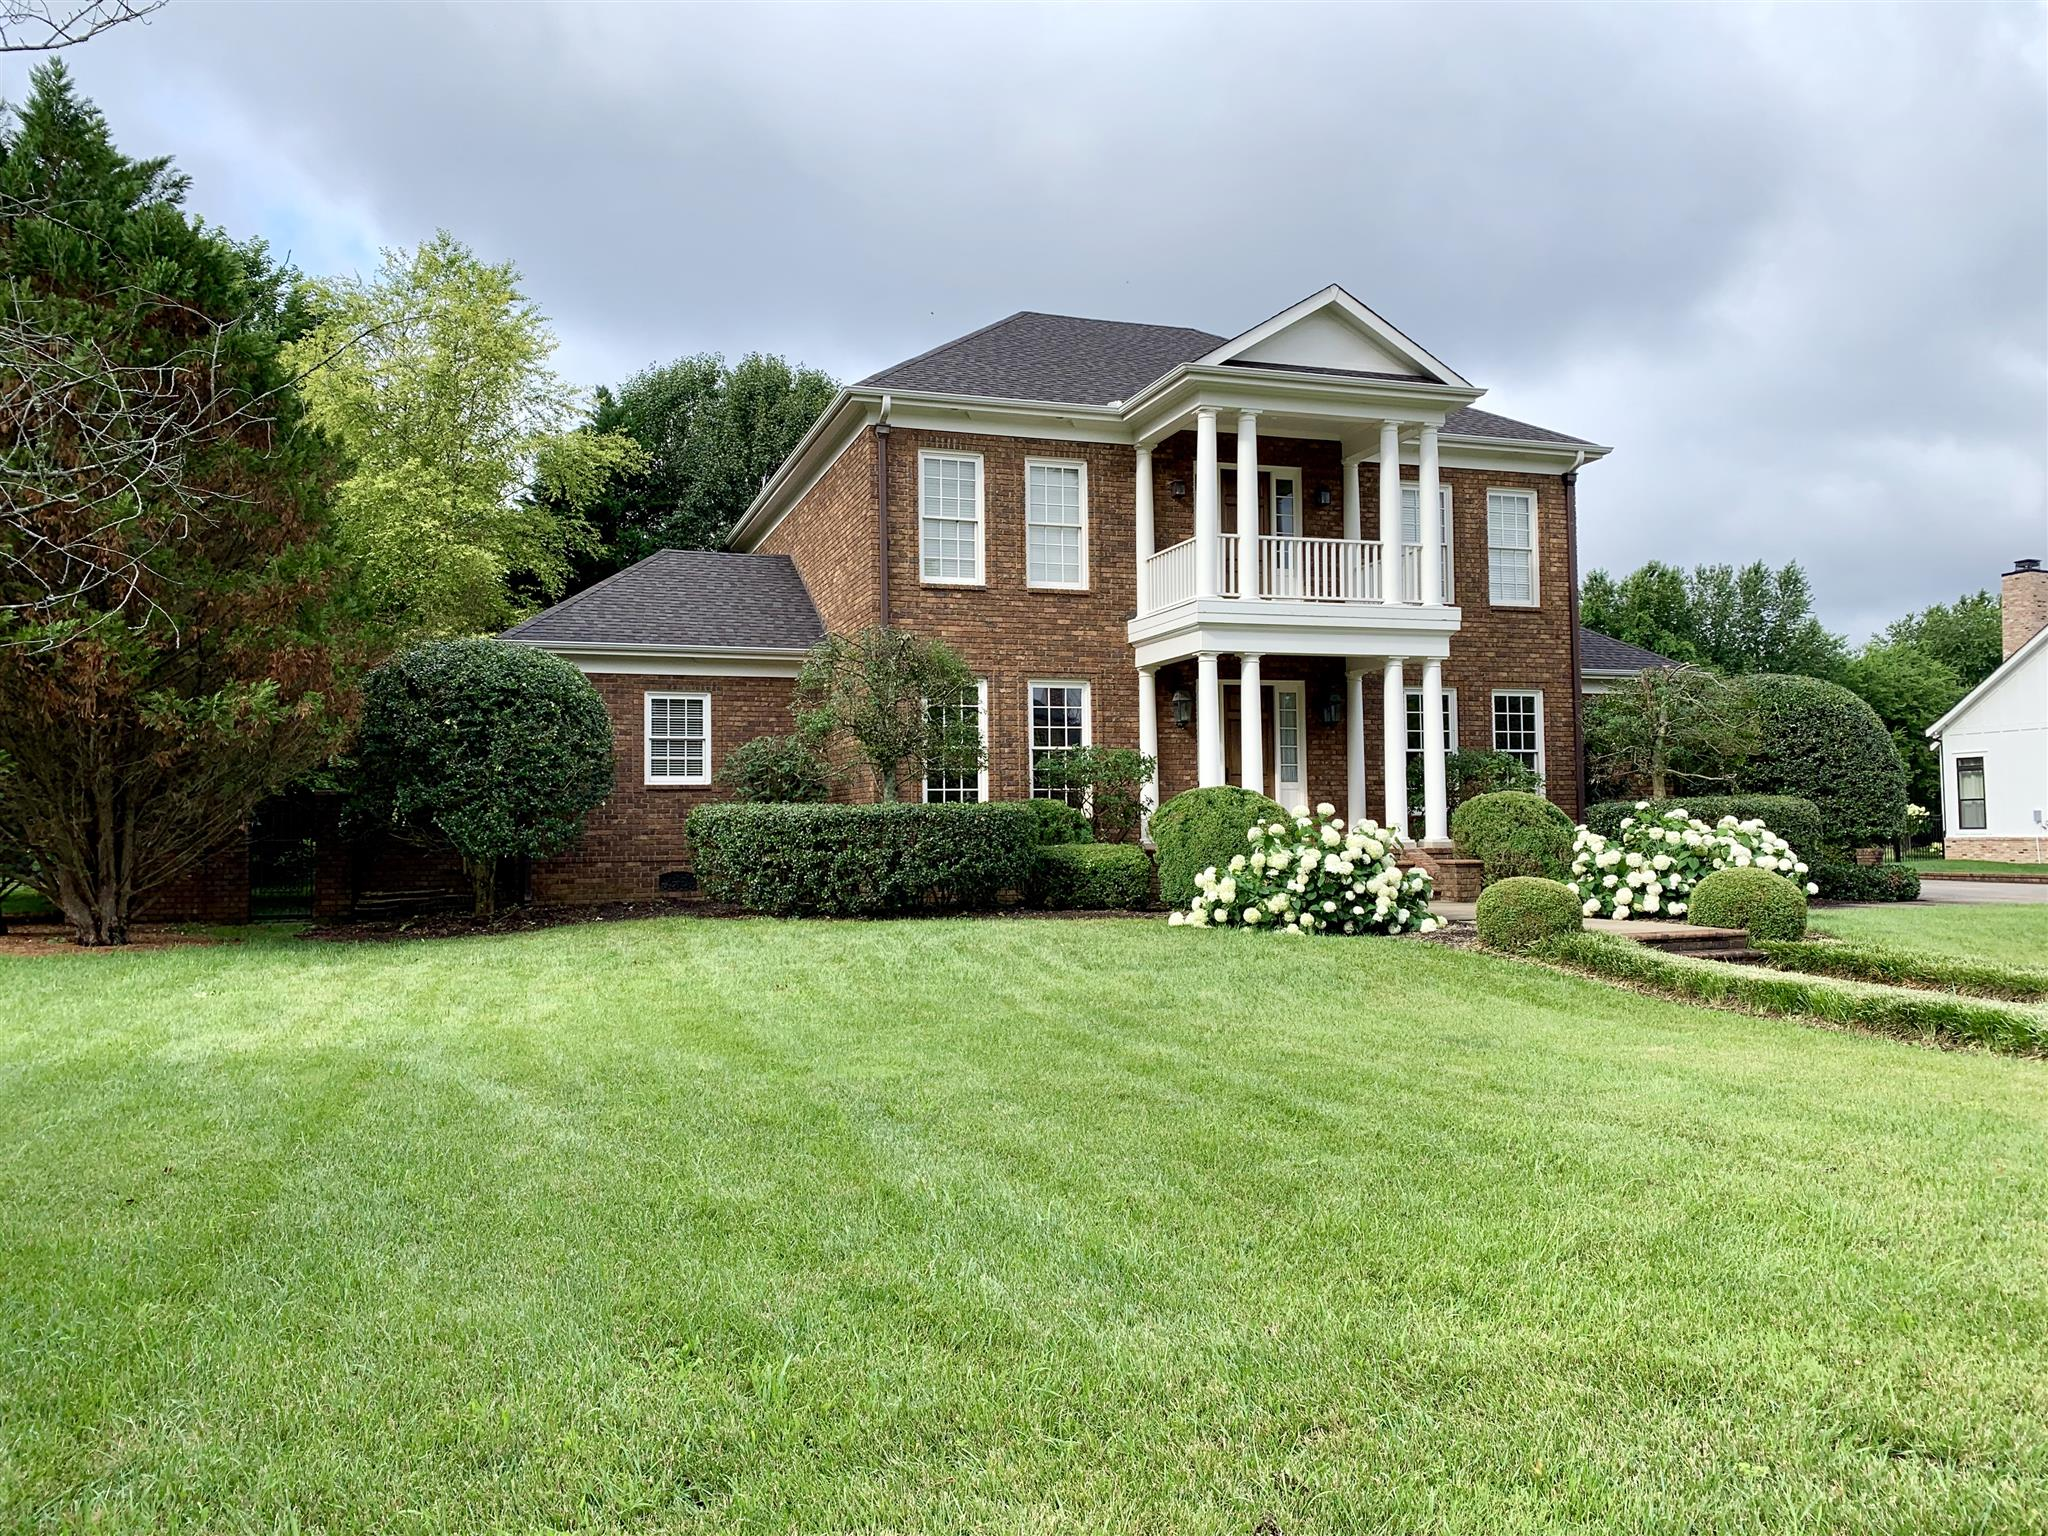 1550 Bear Branch Cv, Murfreesboro, TN 37130 - Murfreesboro, TN real estate listing